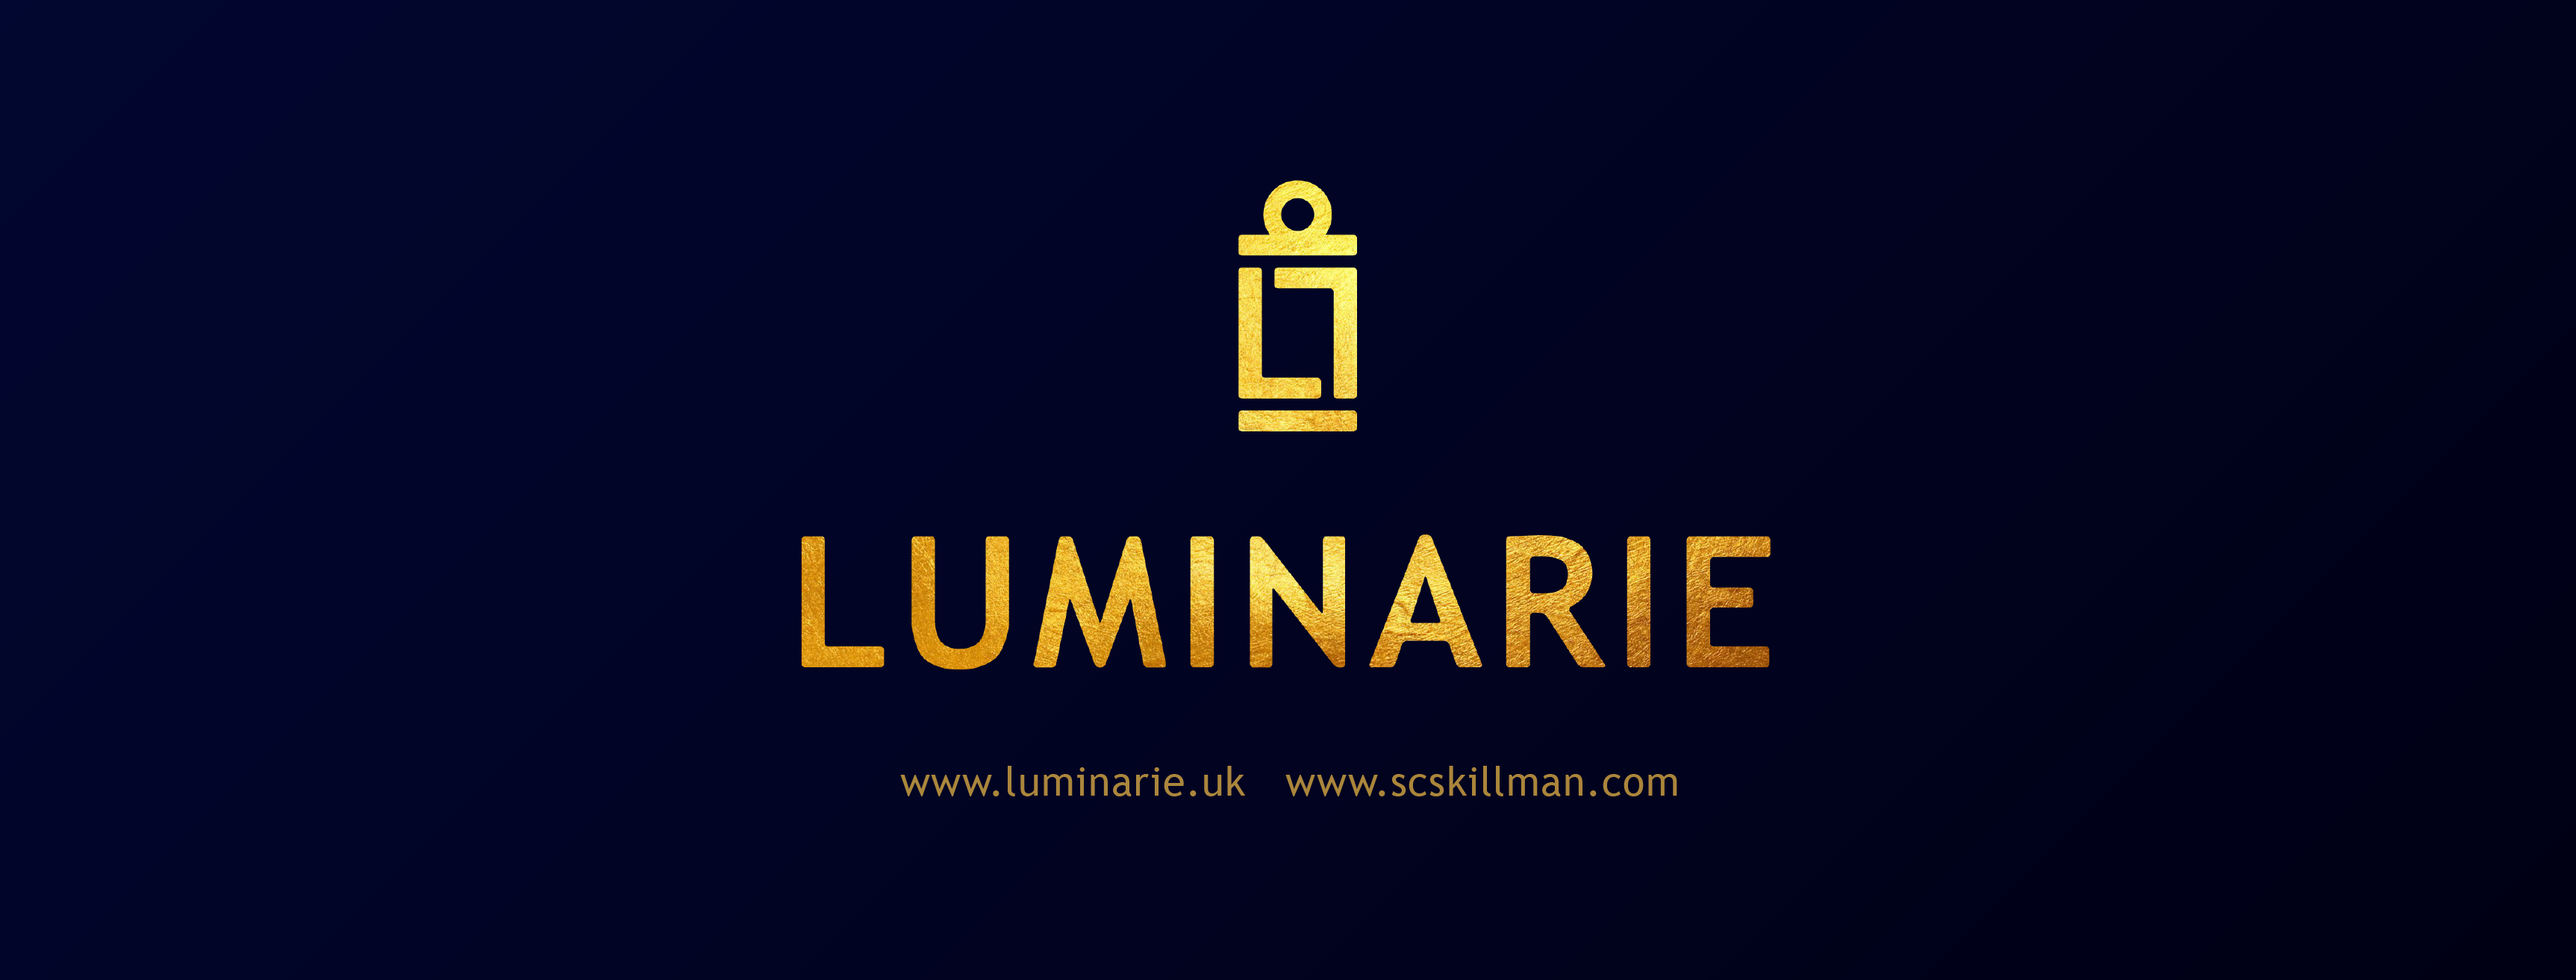 Logo and brand-name for Luminarie publishing company www.scskillman.com; www.luminarie.uk